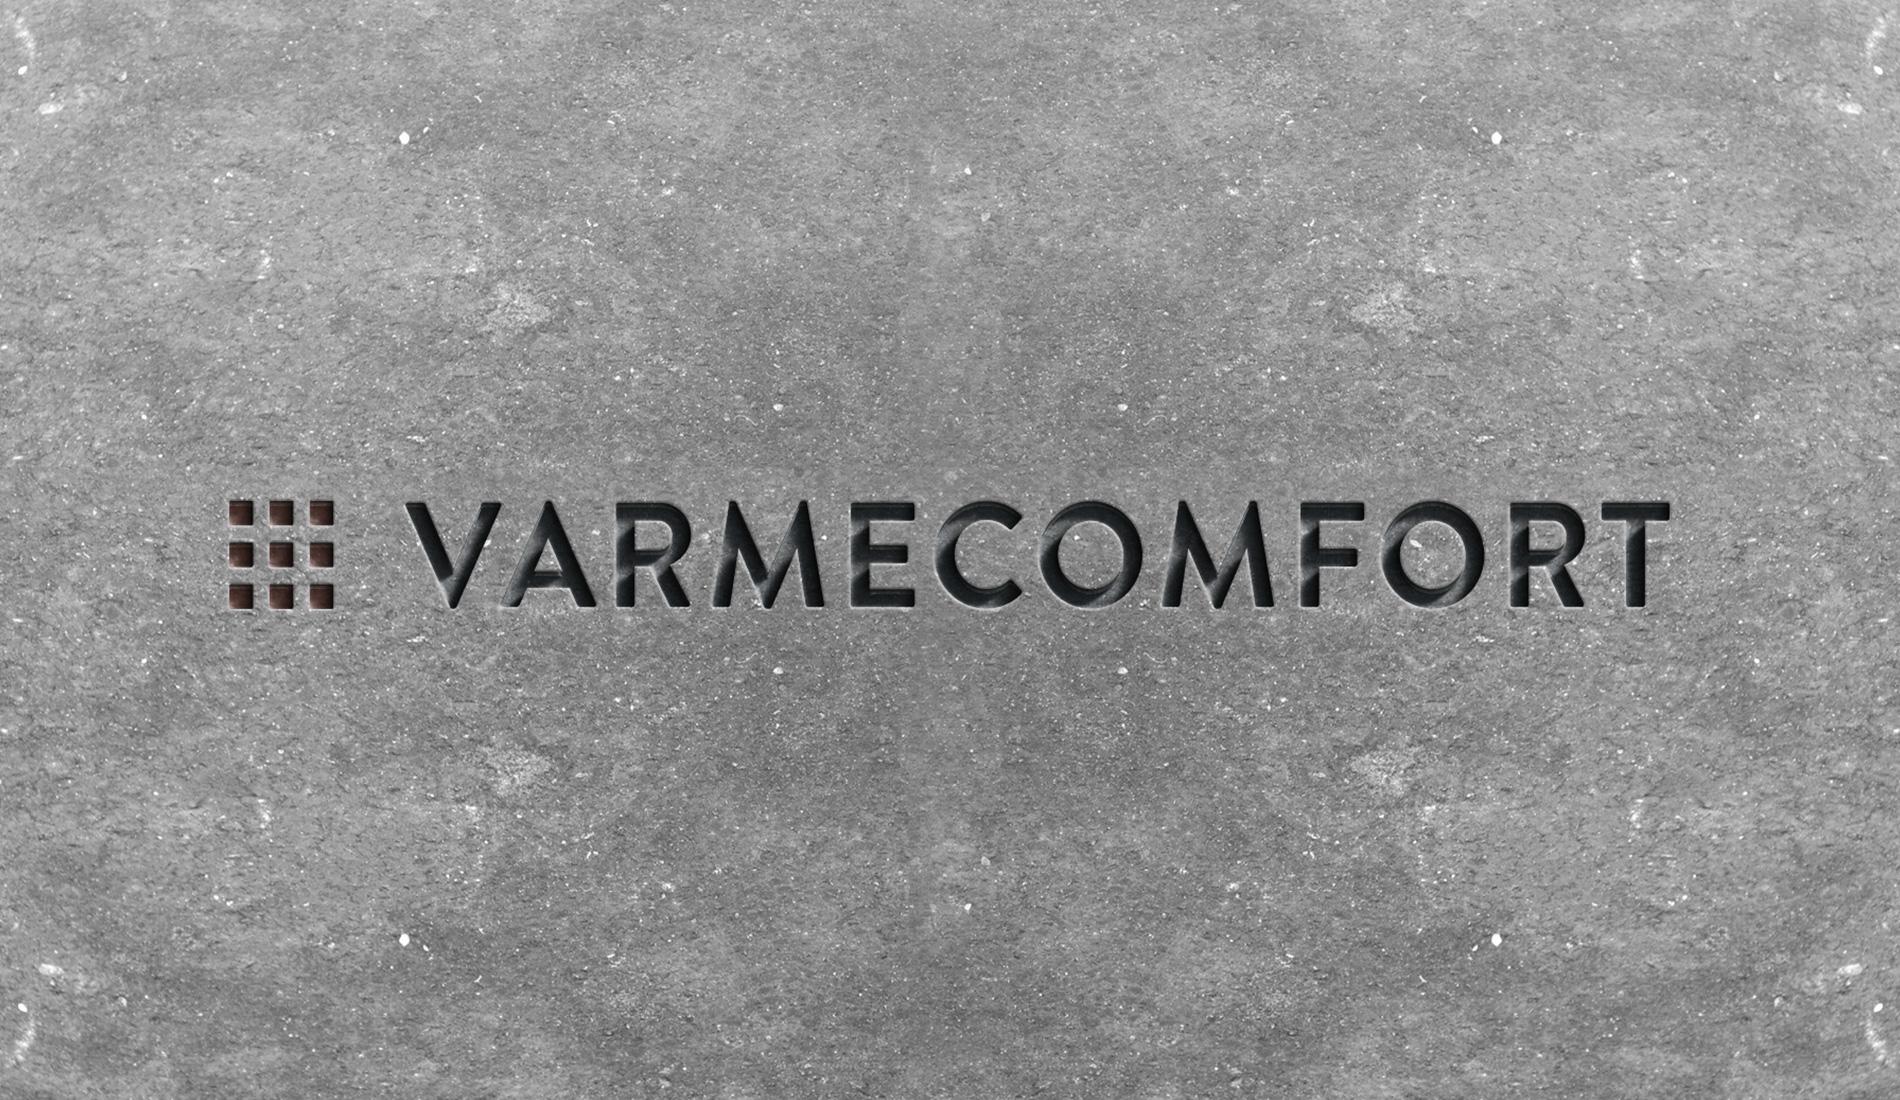 ohHello Design Project | Varmecomfort Identity